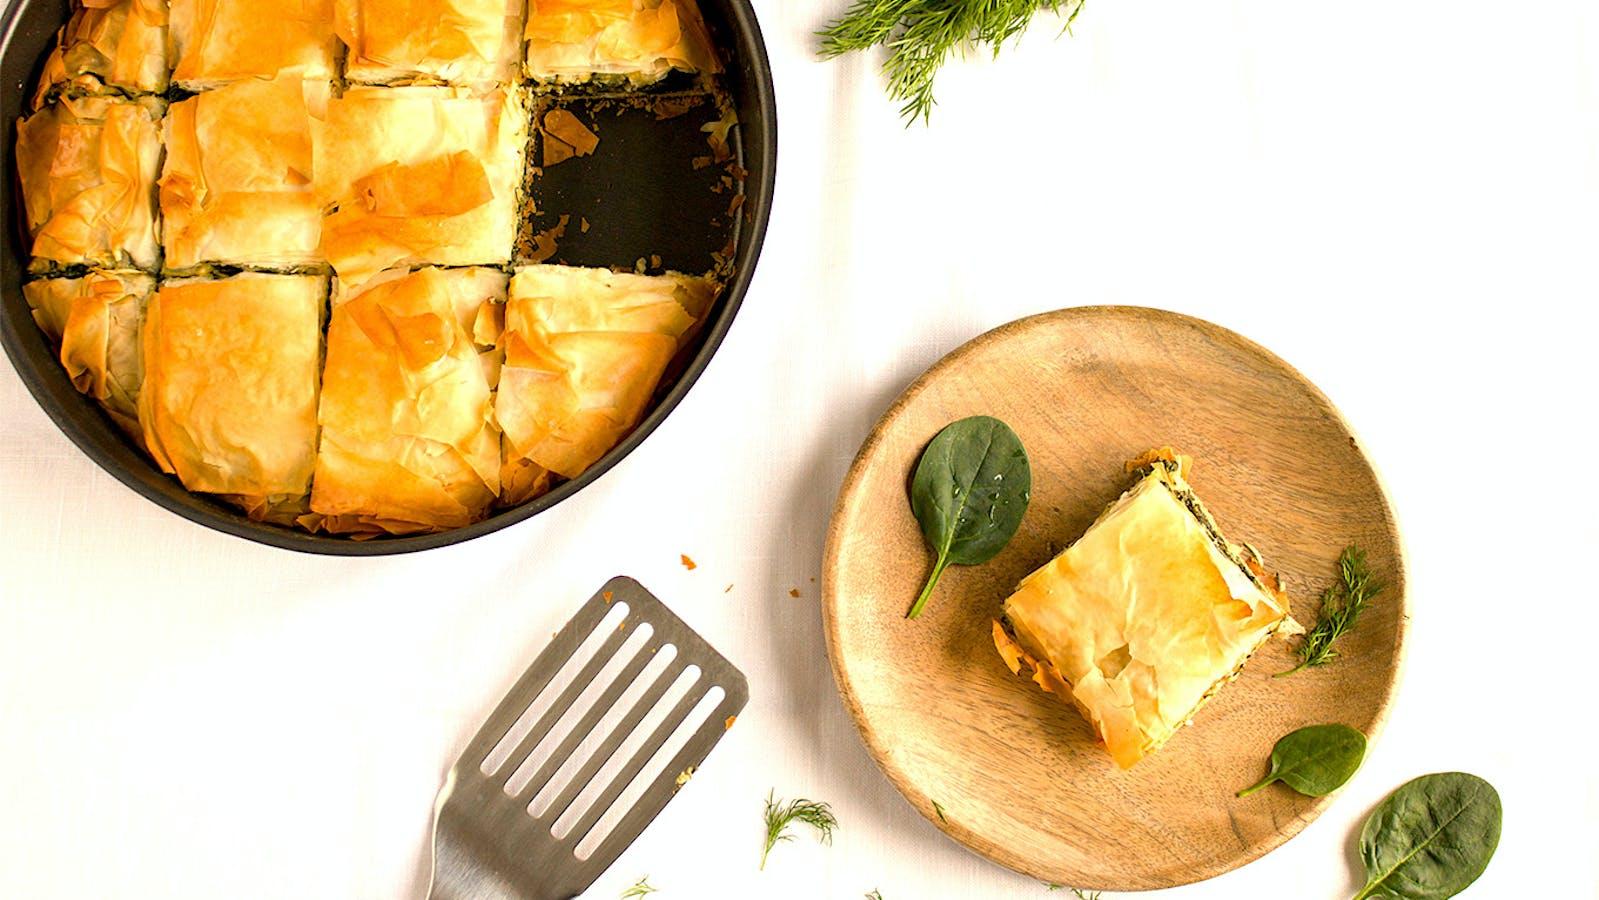 Spanakopita, the Greek spinach pie recipe